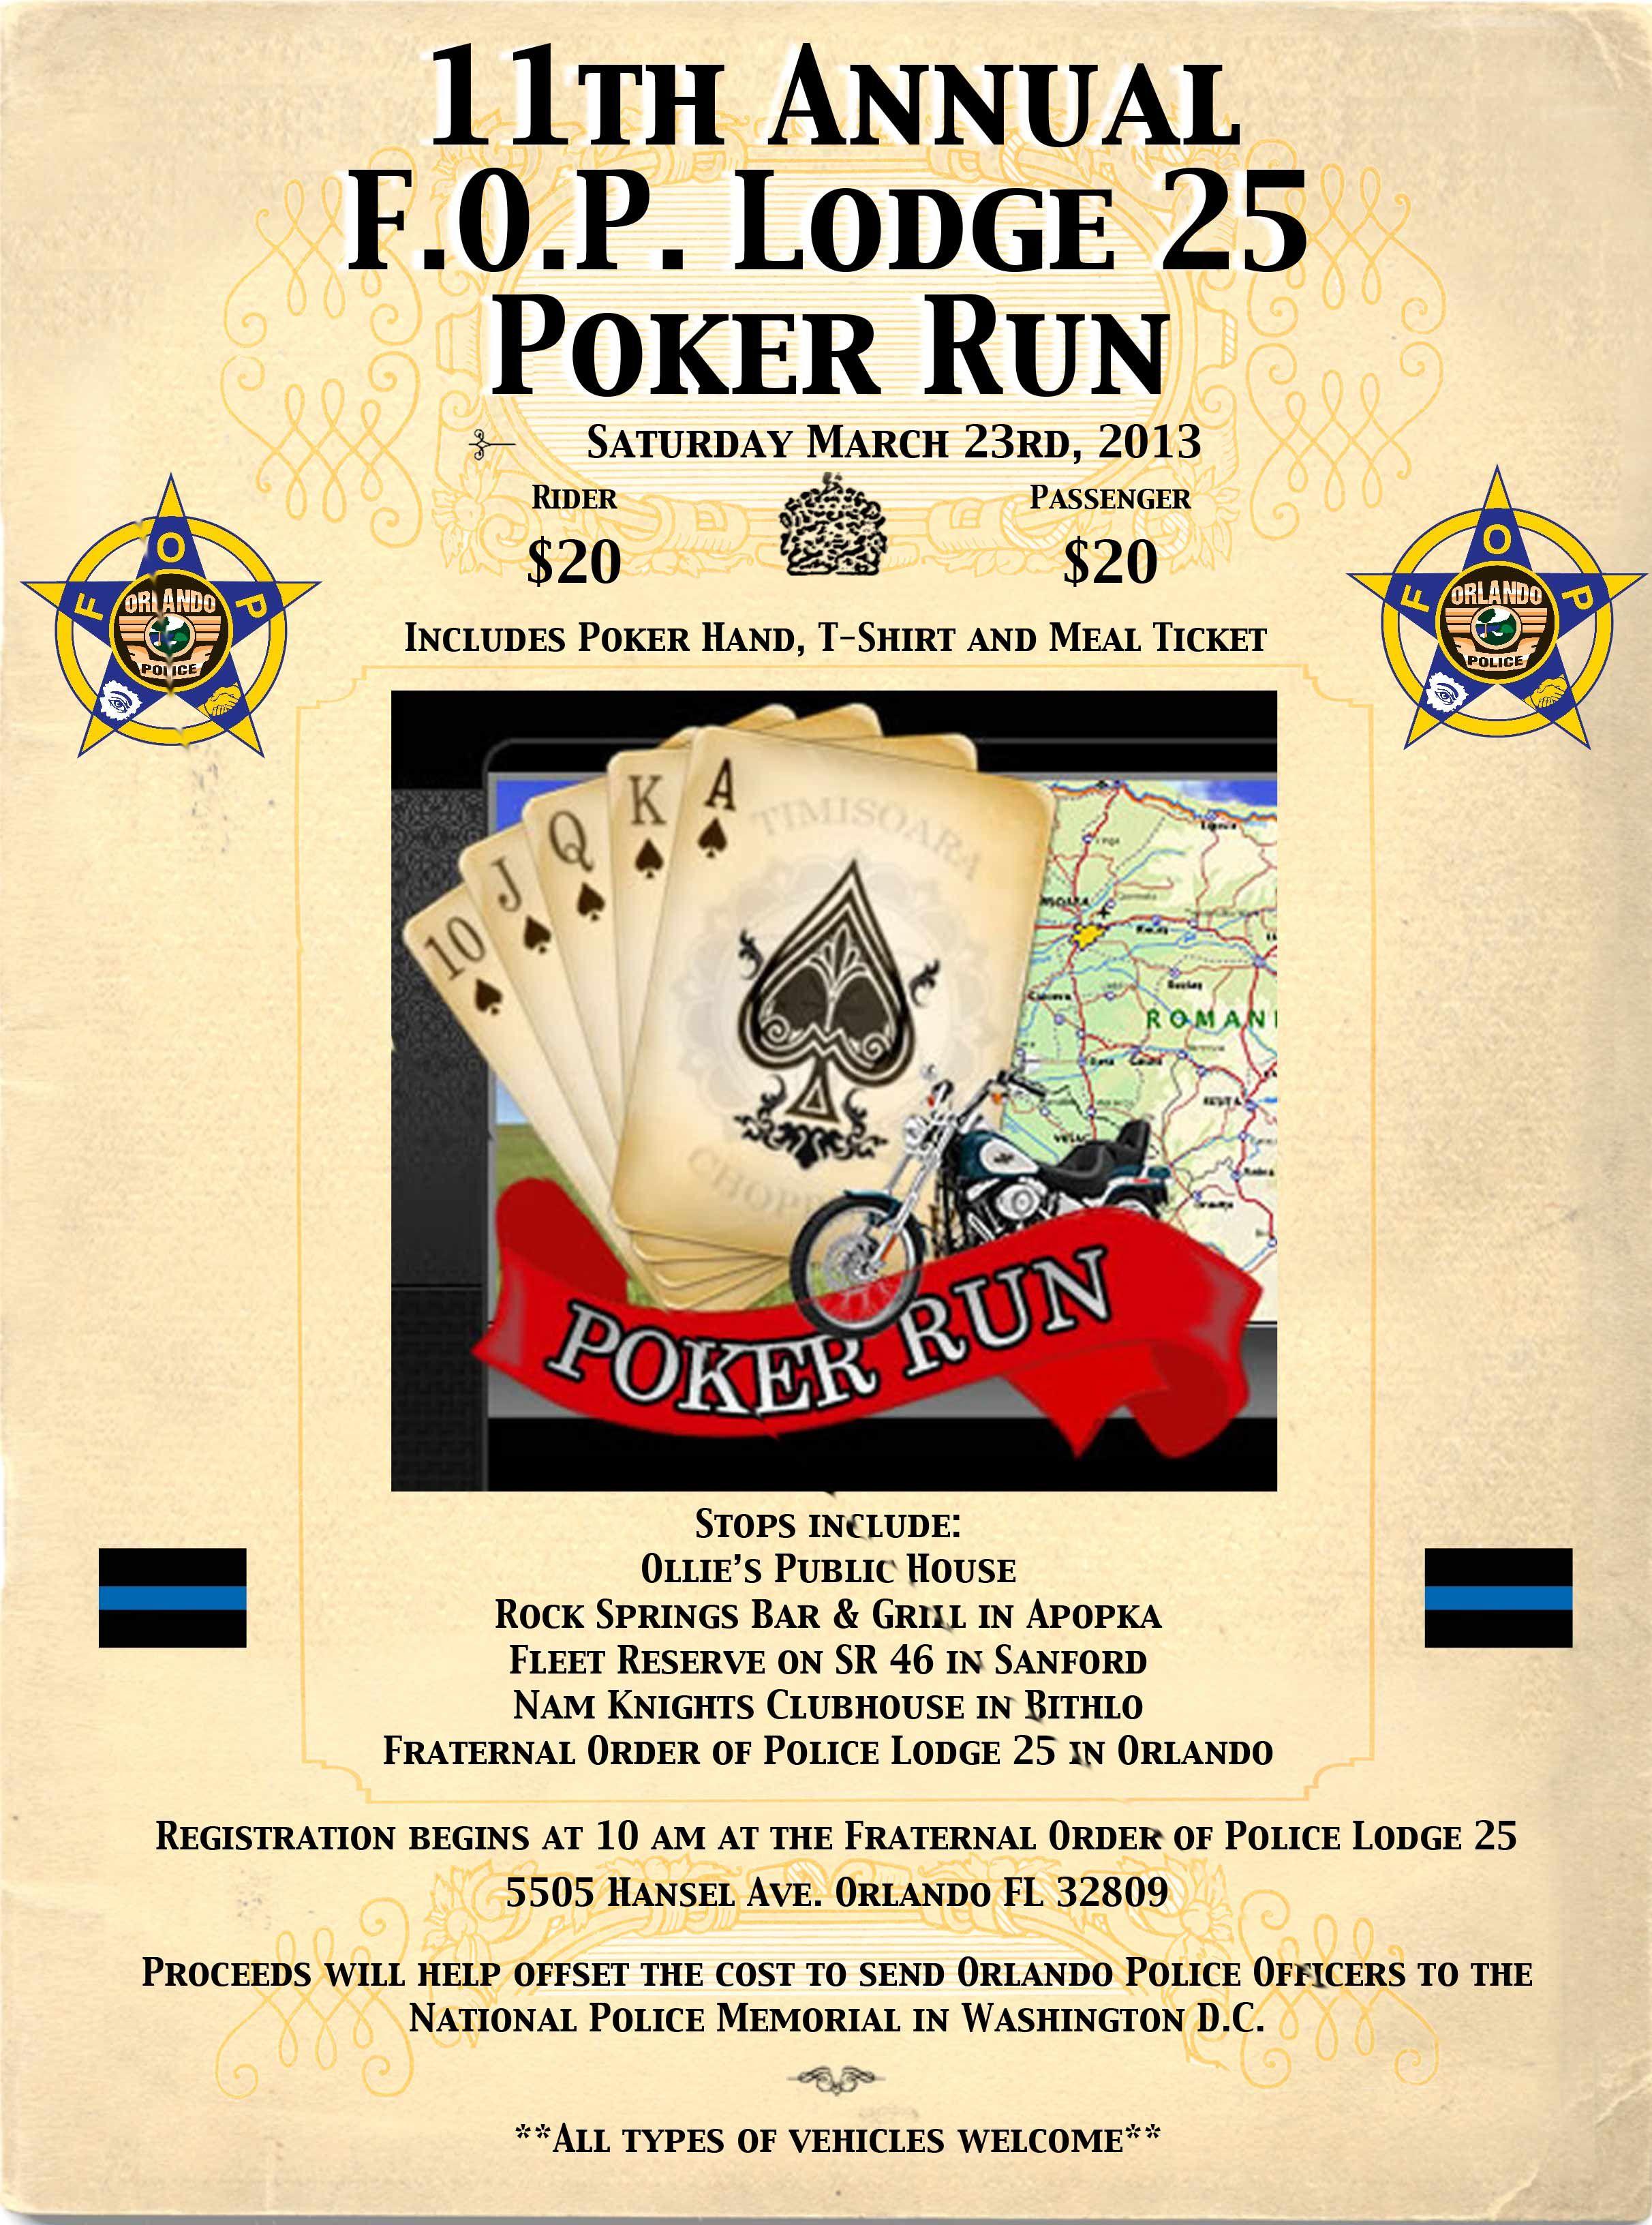 11th Annual Poker Run Flyerg 24243264 Pixels Poker Run Ideas